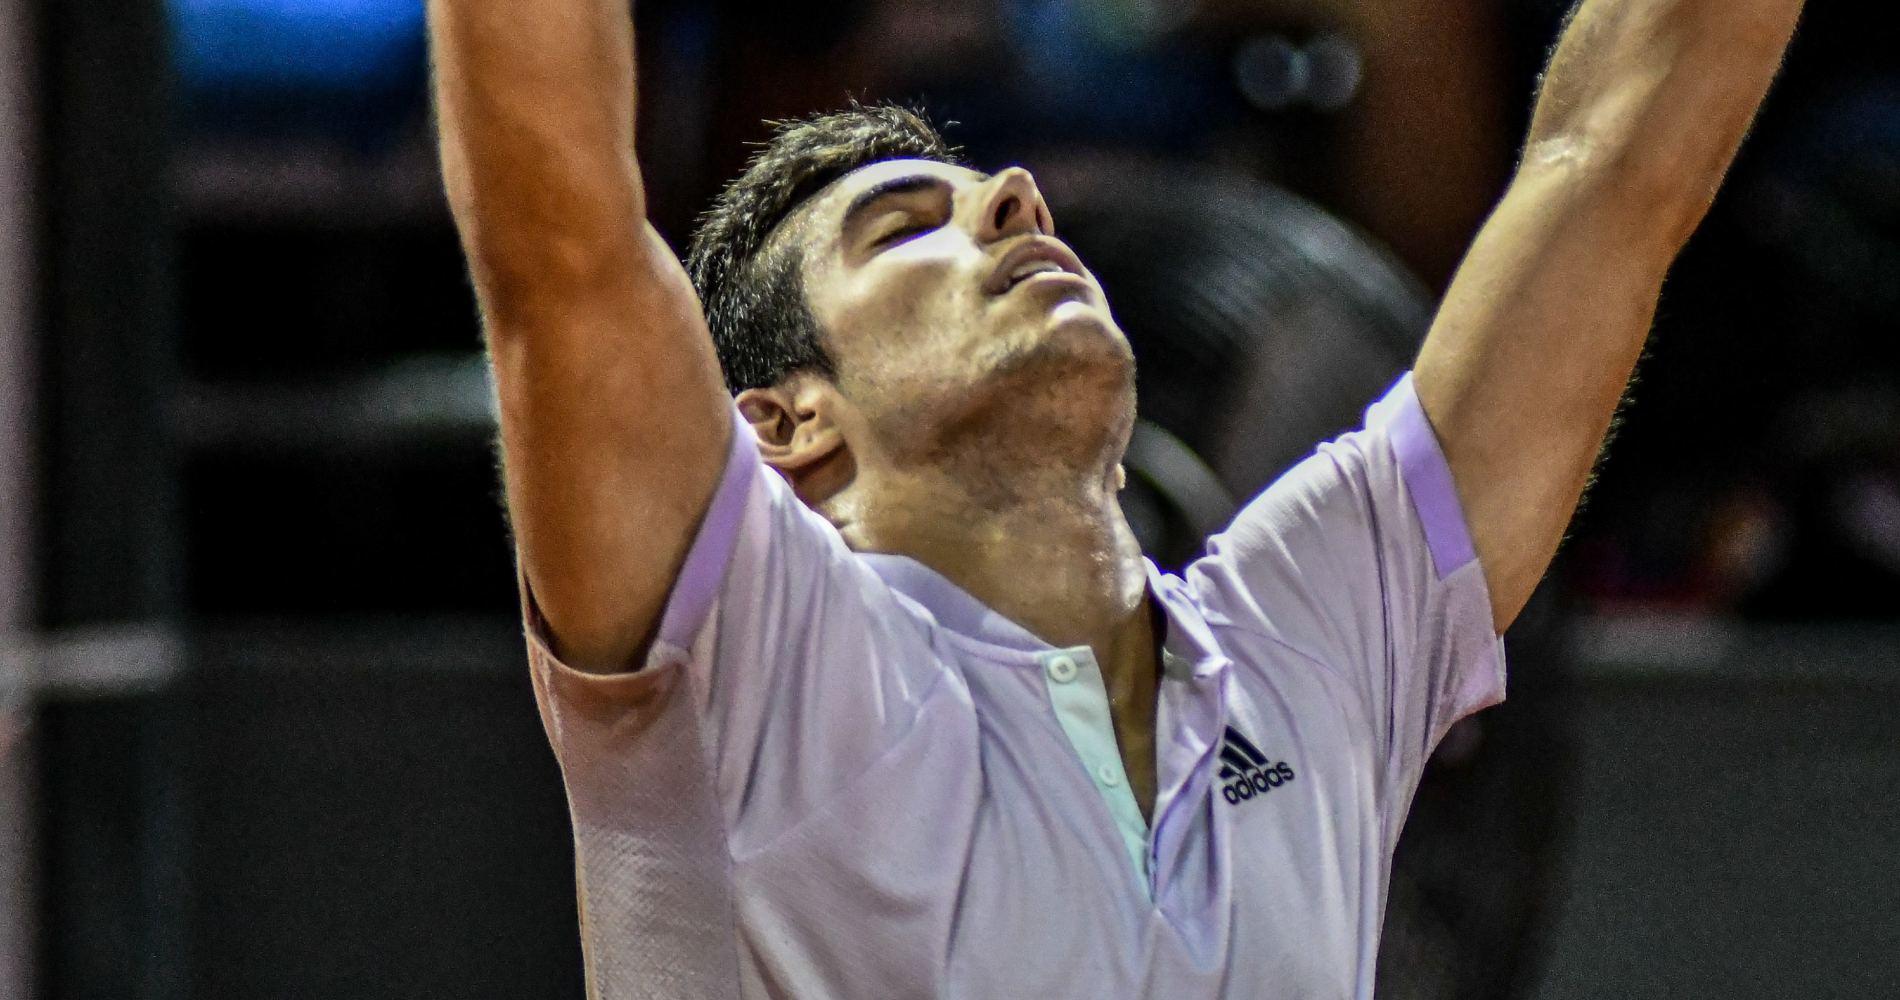 Cristian Garin, Rio, 2020